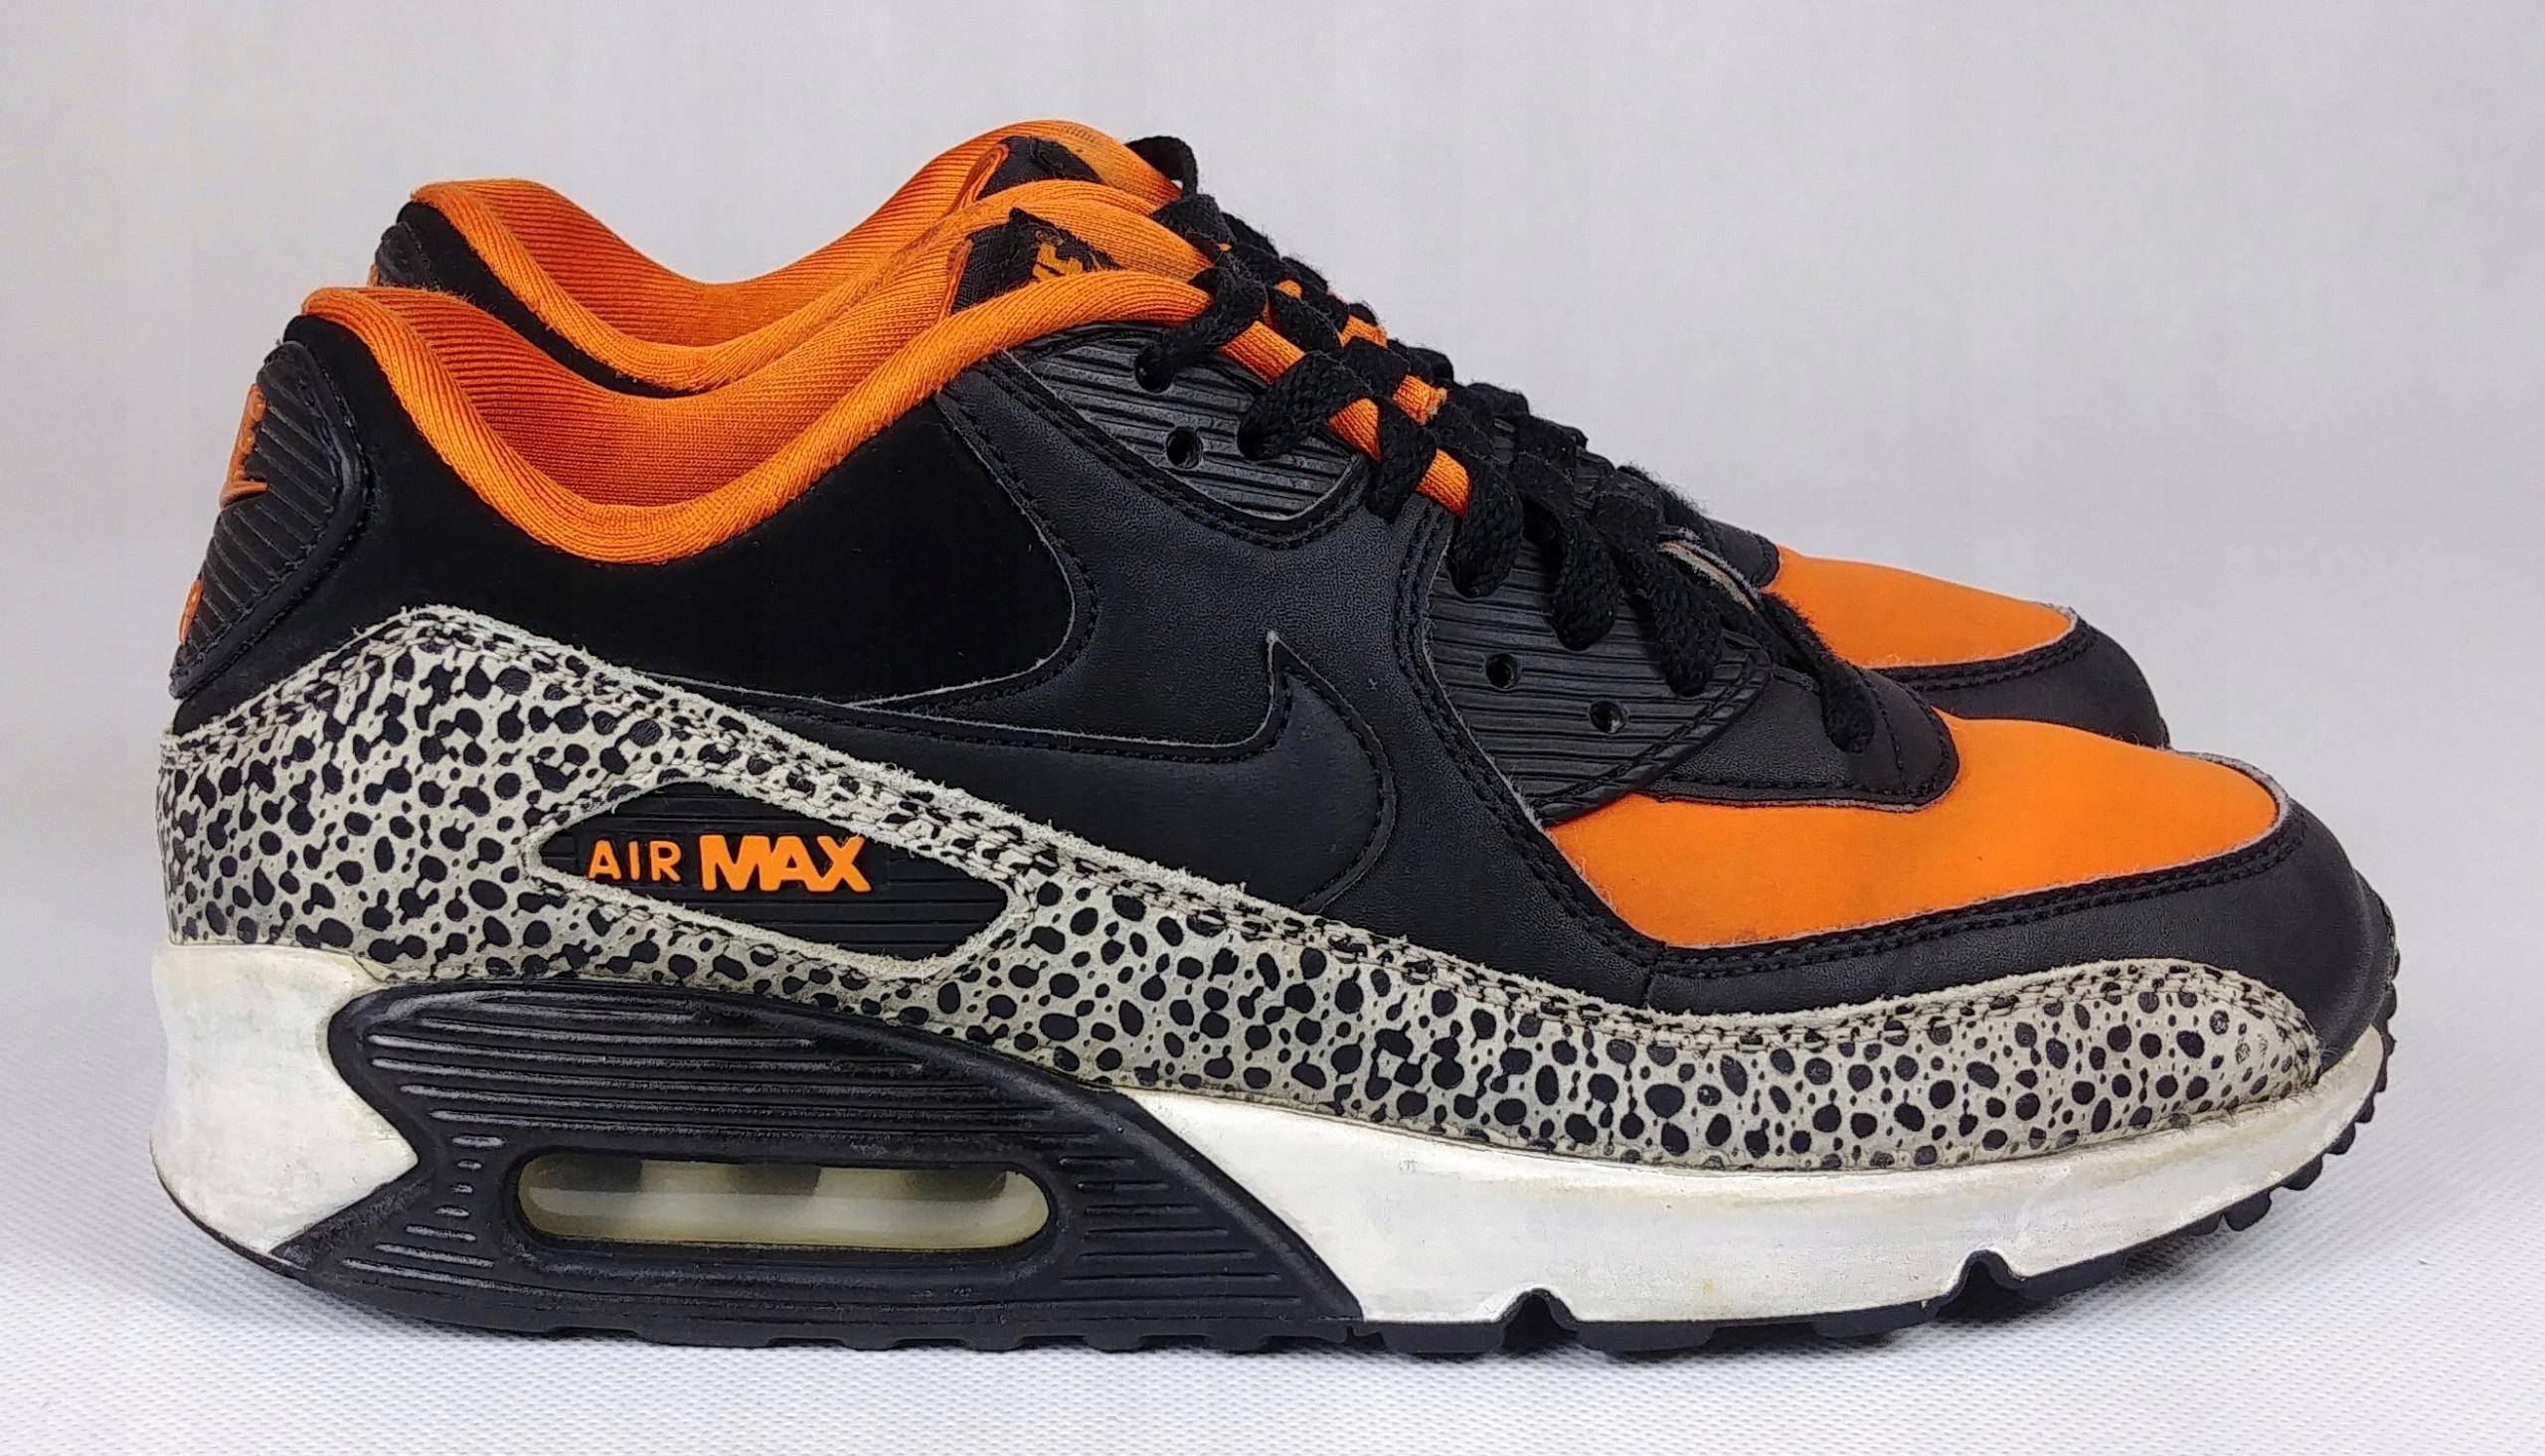 2103bfea NIKE AIR MAX 90 SAFARI buty sportowe damskie r. 40 - 7454475414 ...